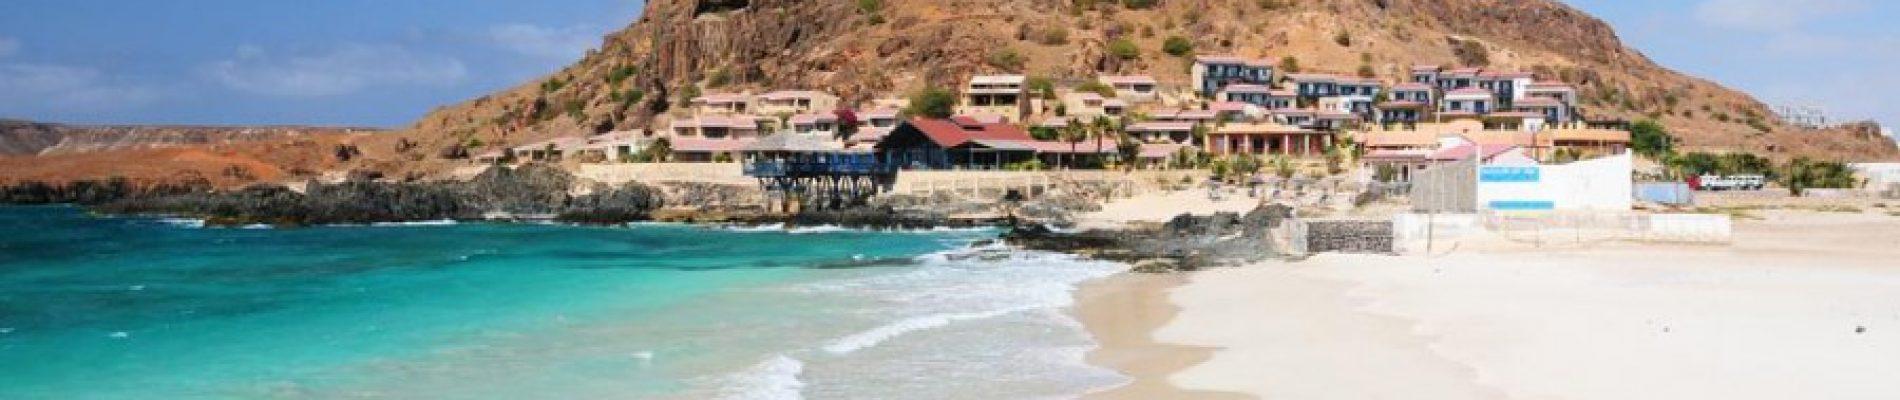 MARINE-CLUB-BEACH-RESORT-4-Boa-Vista-Capo-Verde-3